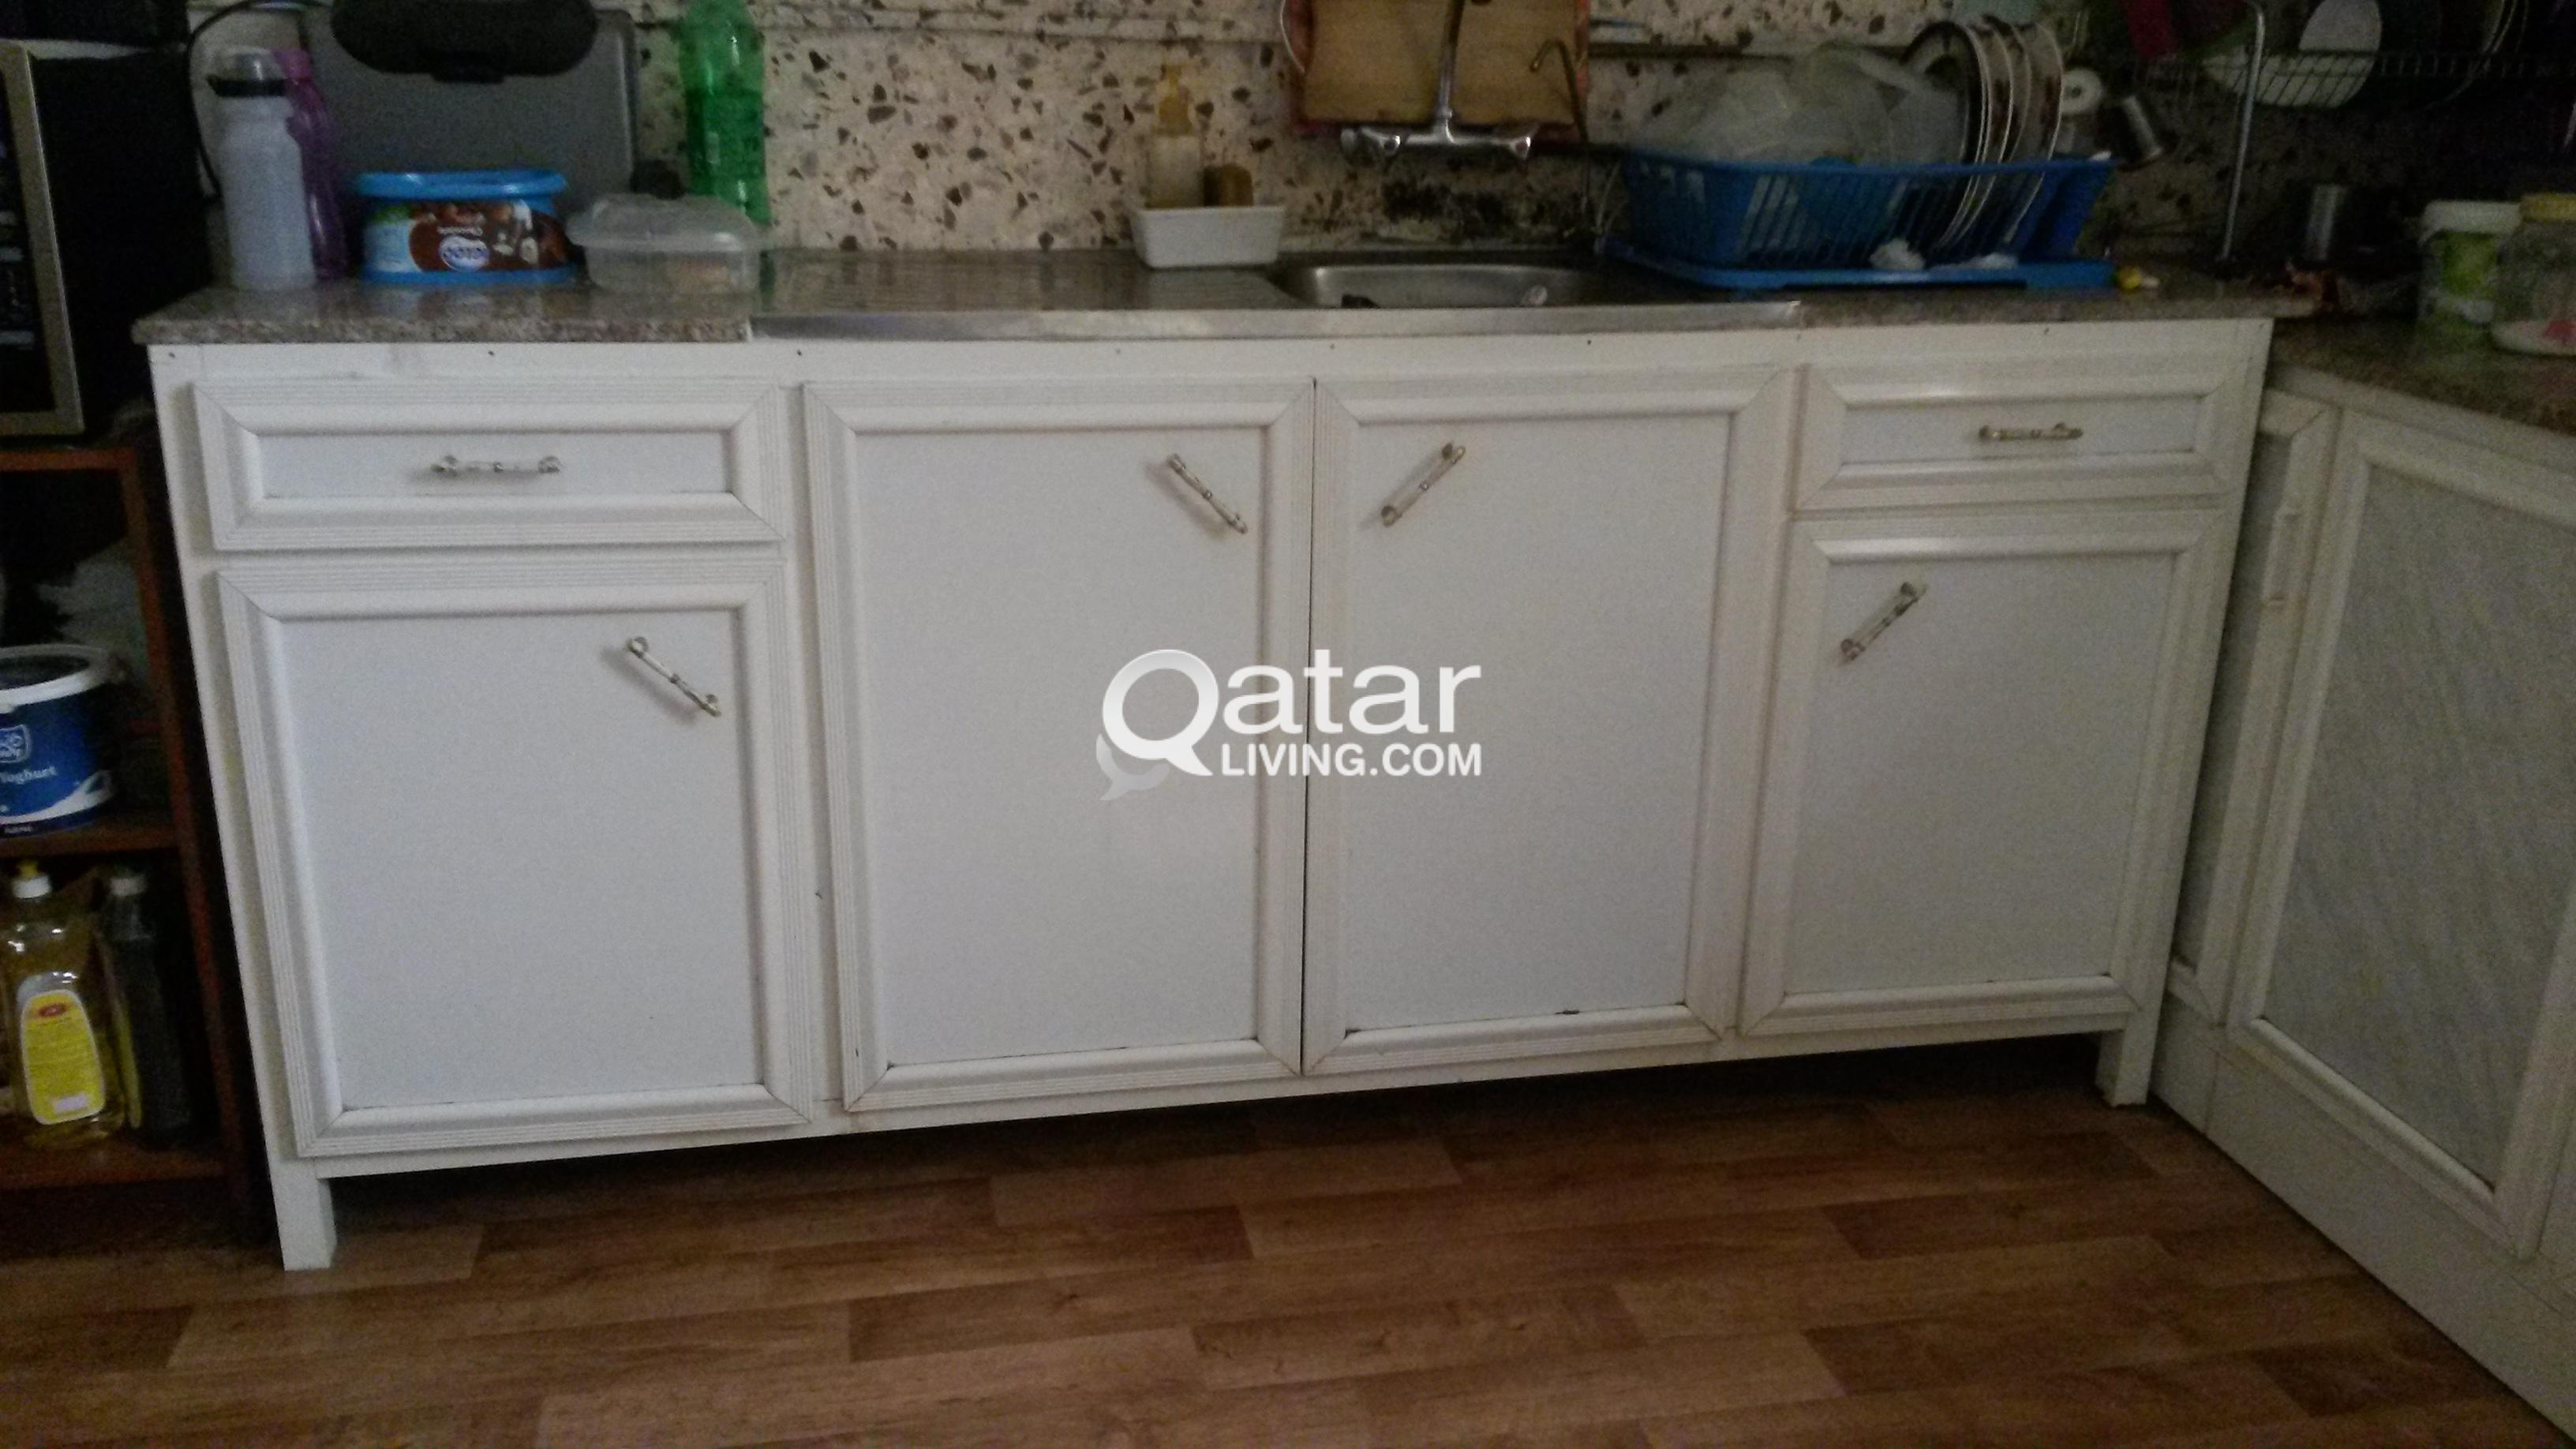 Kitchen Cabinets Qatar Living